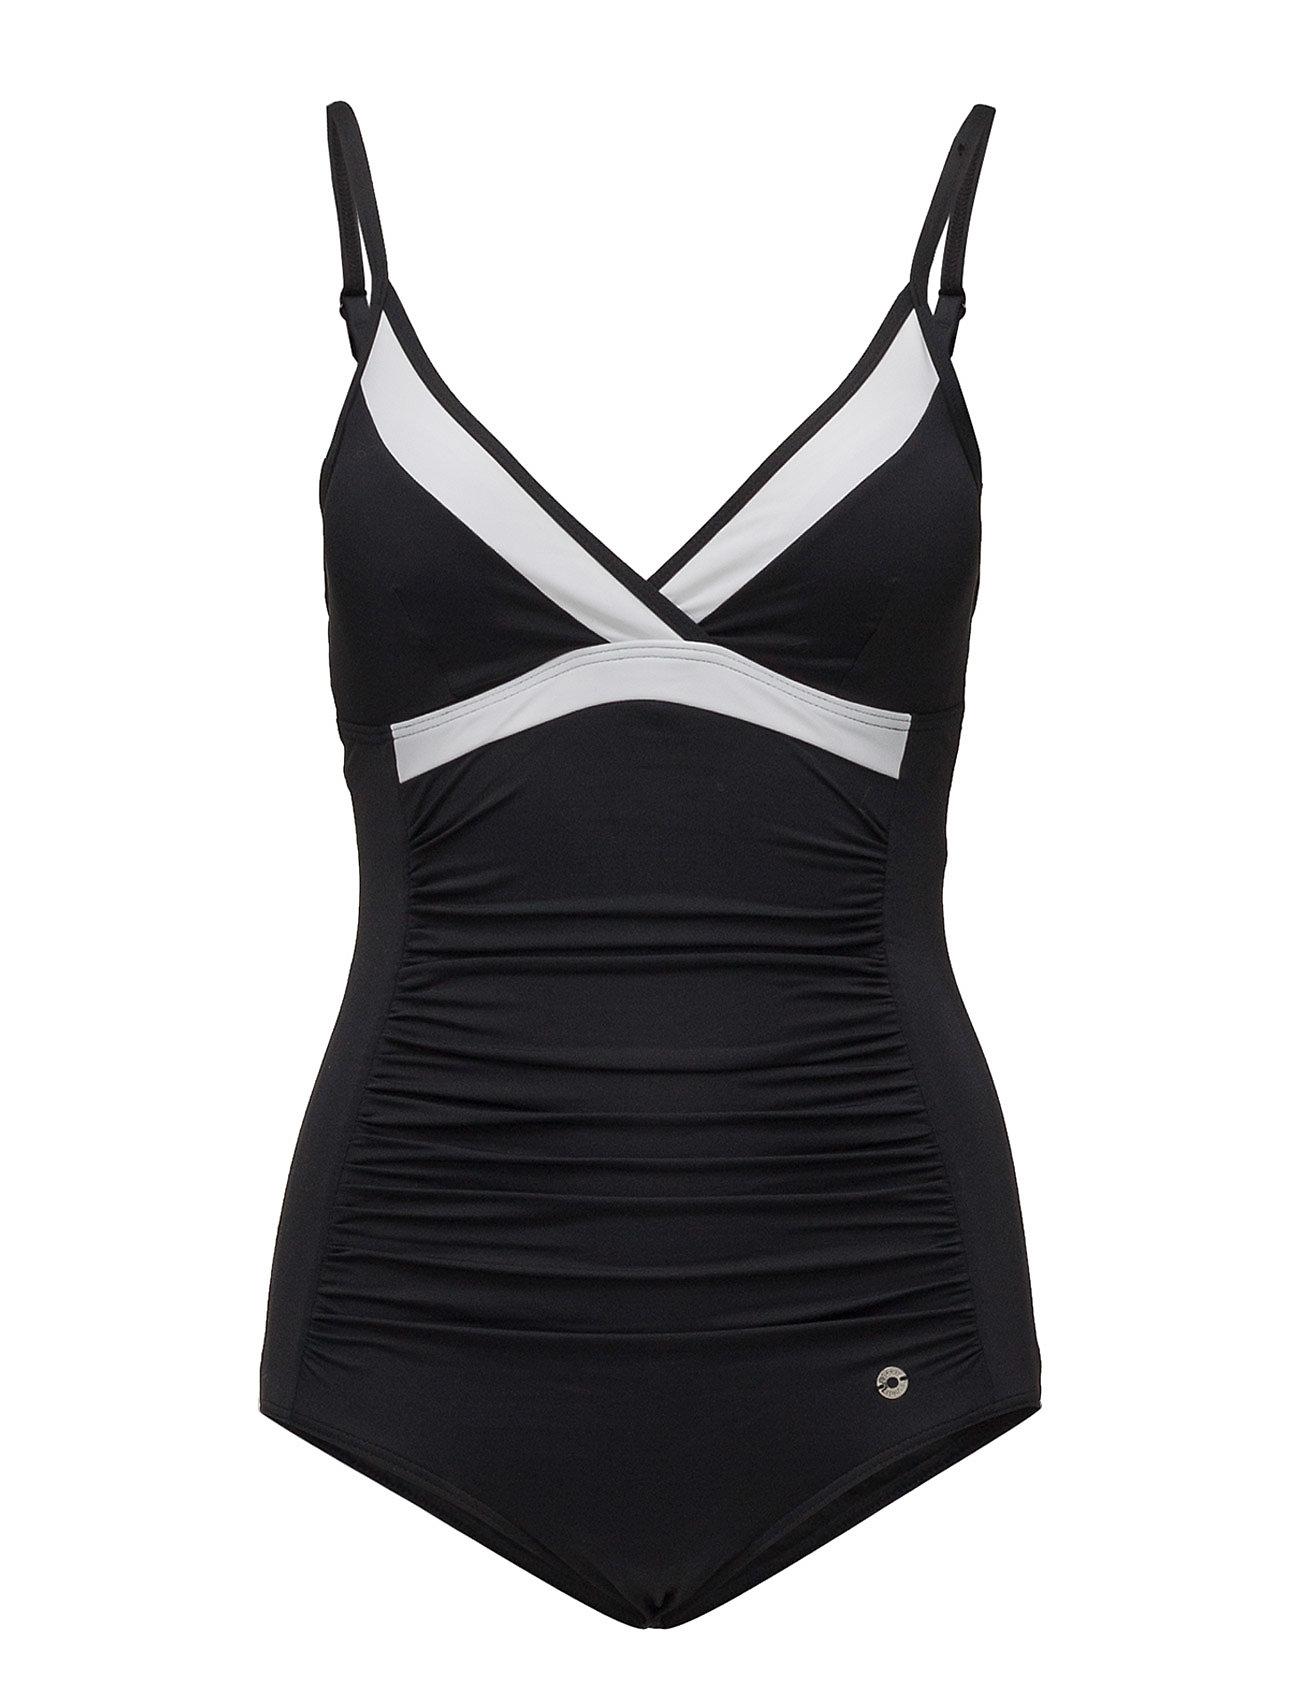 Swimsuits Esprit Bodywear Women Badetøj til Damer i Sort